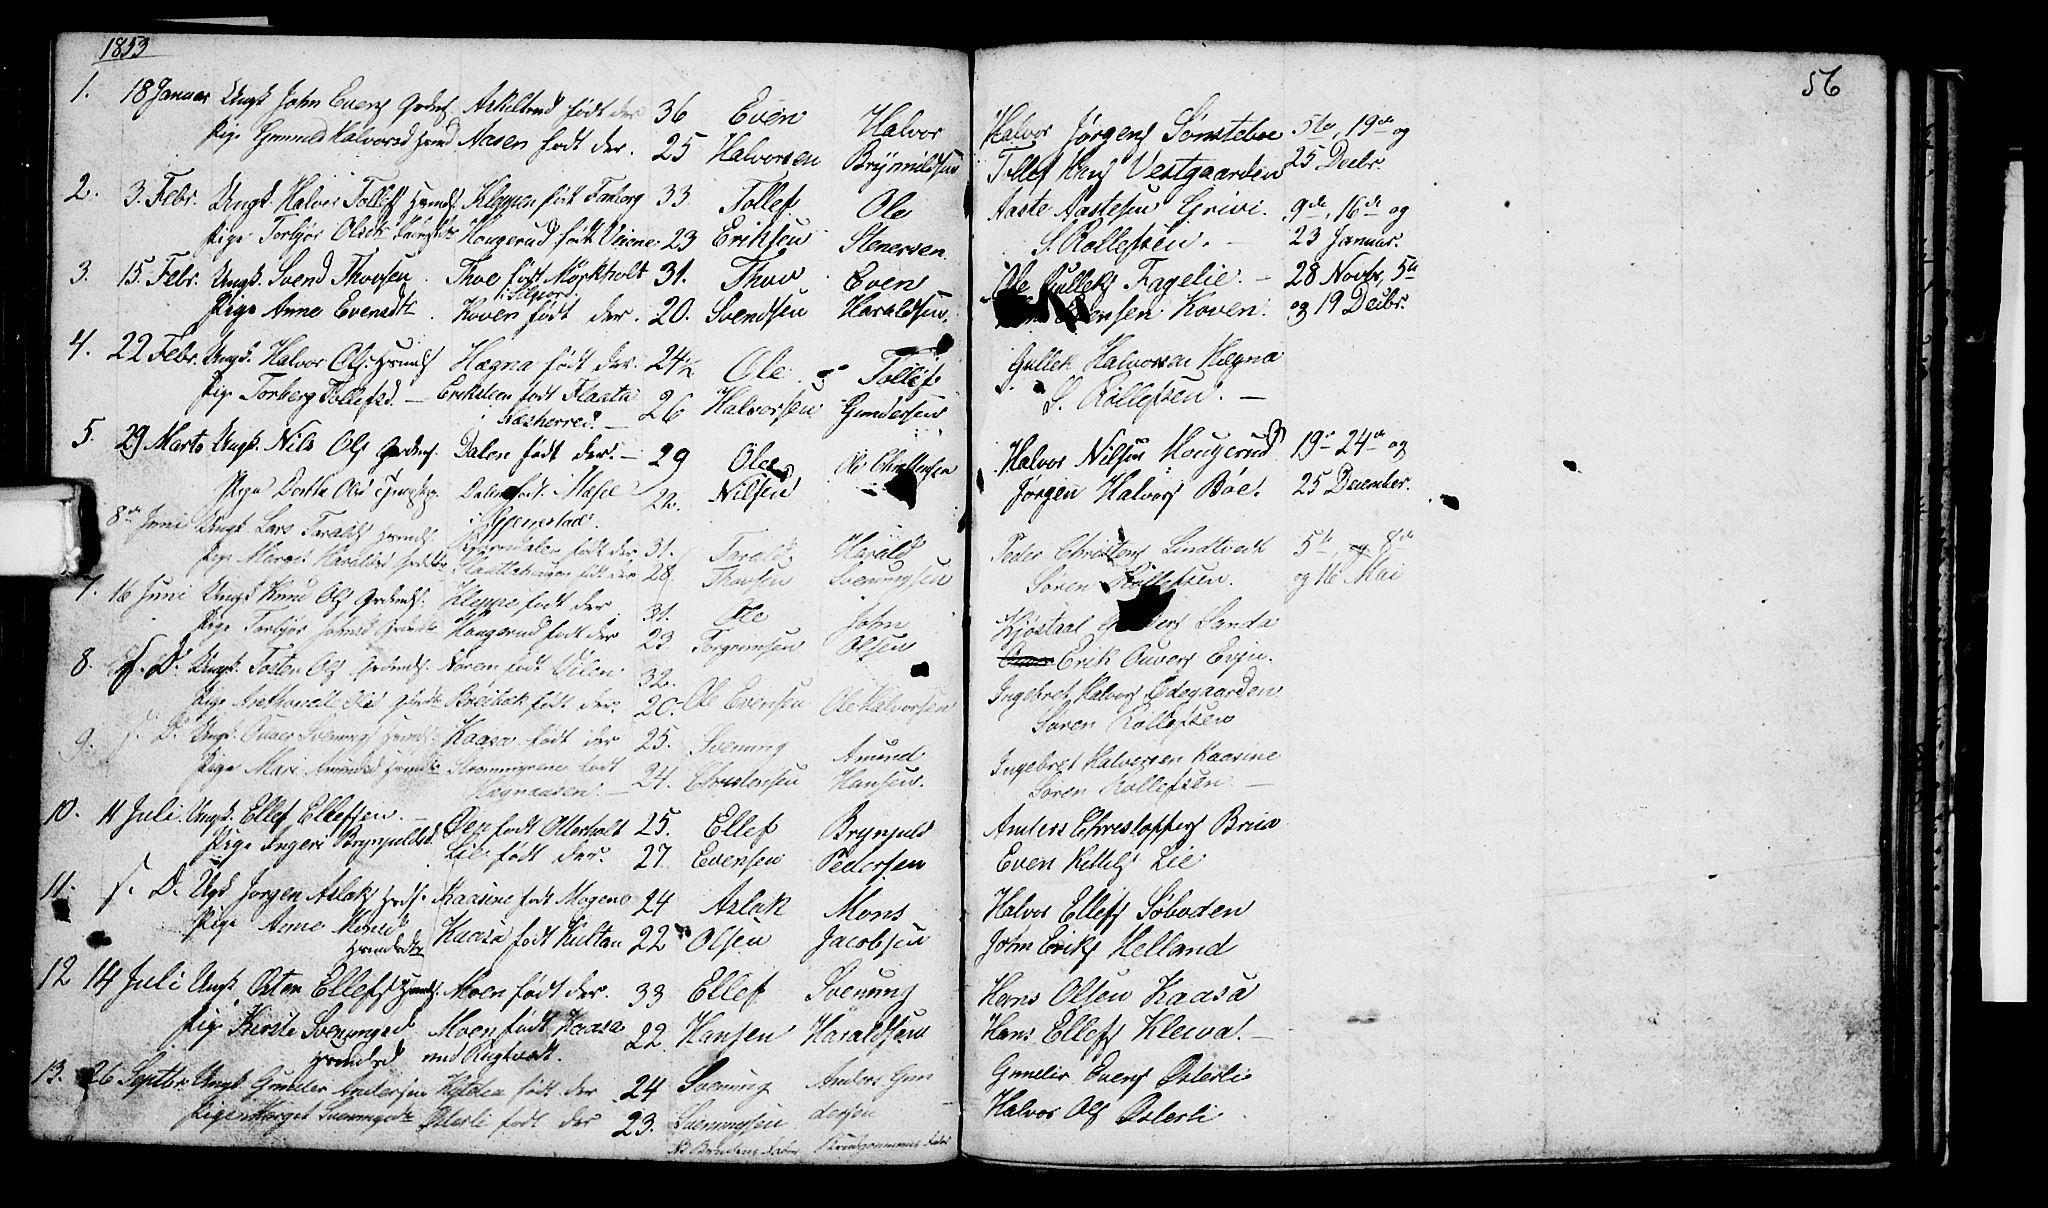 SAKO, Bø kirkebøker, G/Ga/L0002: Klokkerbok nr. 2, 1853-1866, s. 56